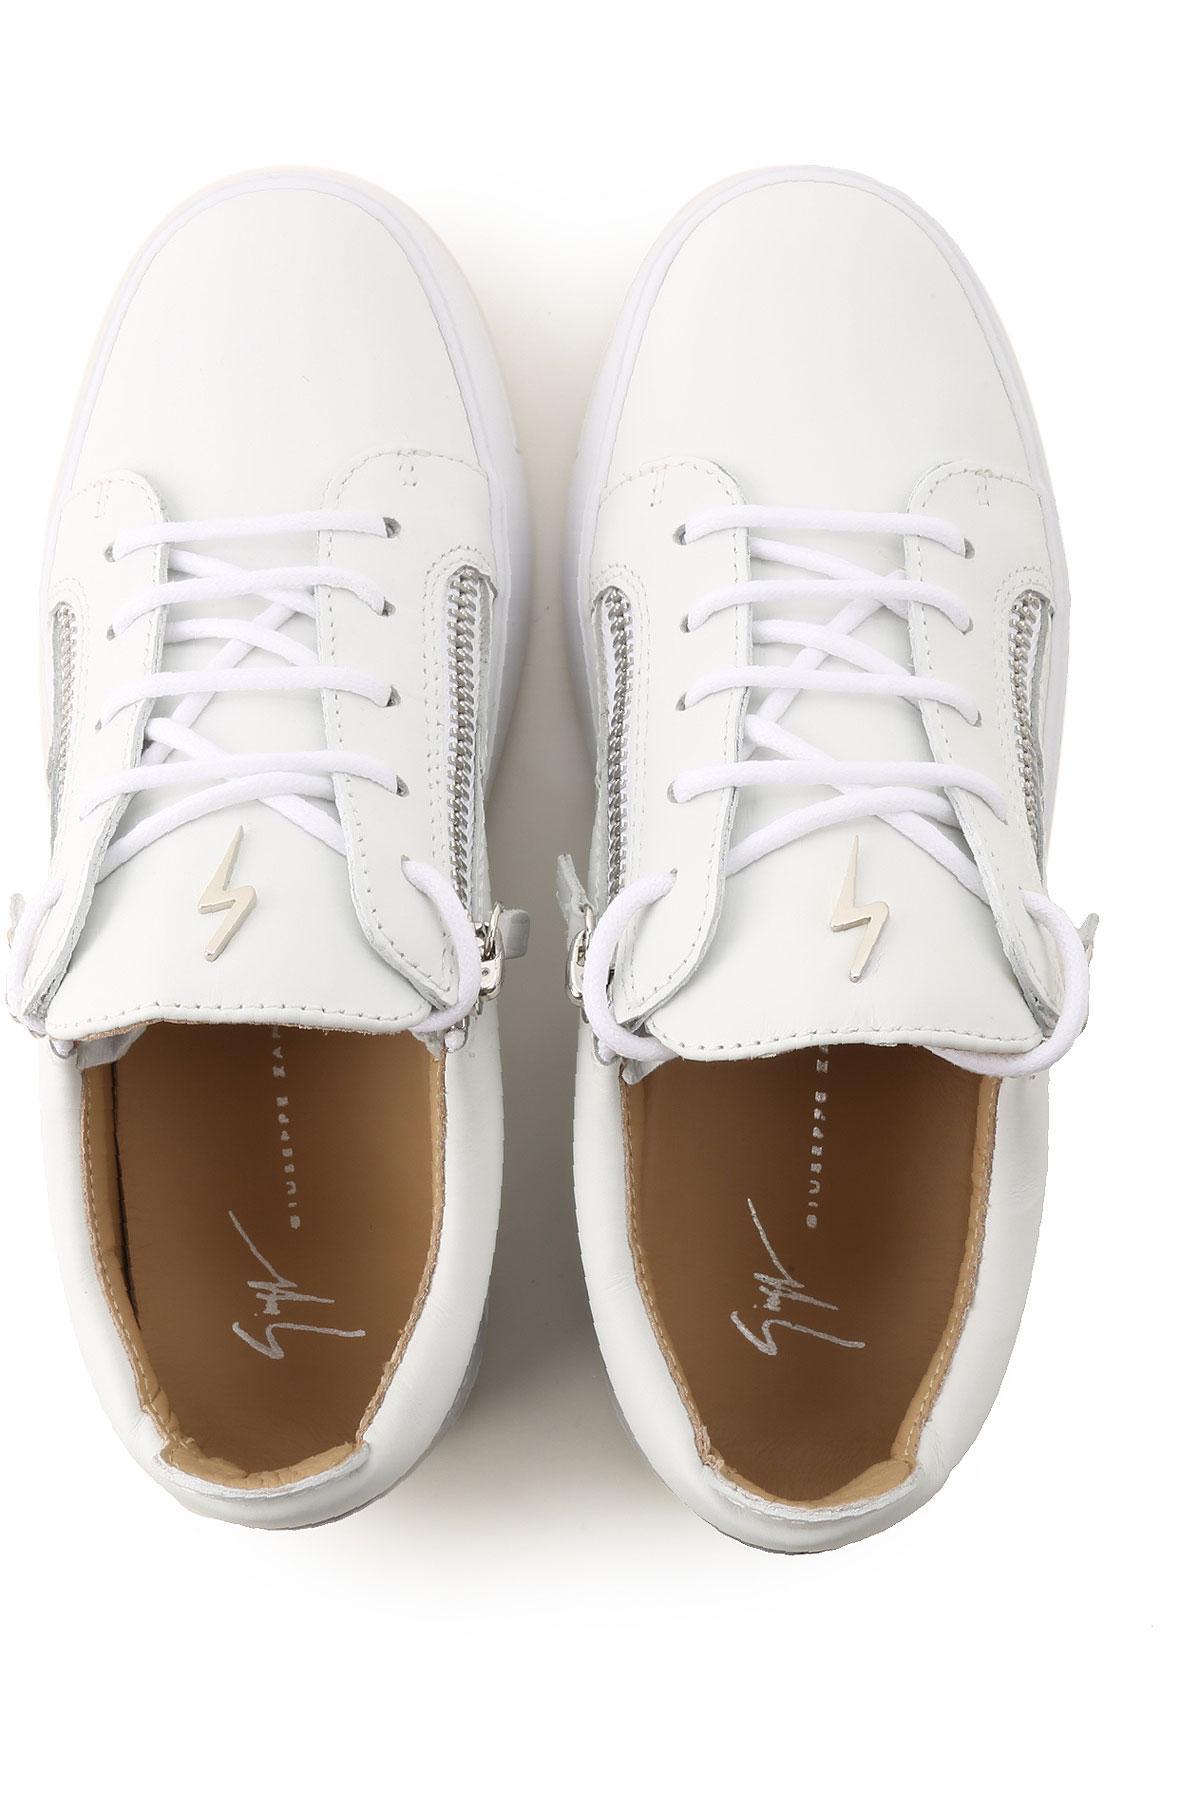 Primavera Blanco Zapatos verano 2019 nbsp; Giuseppe Zanotti Mujer Para UCwI64